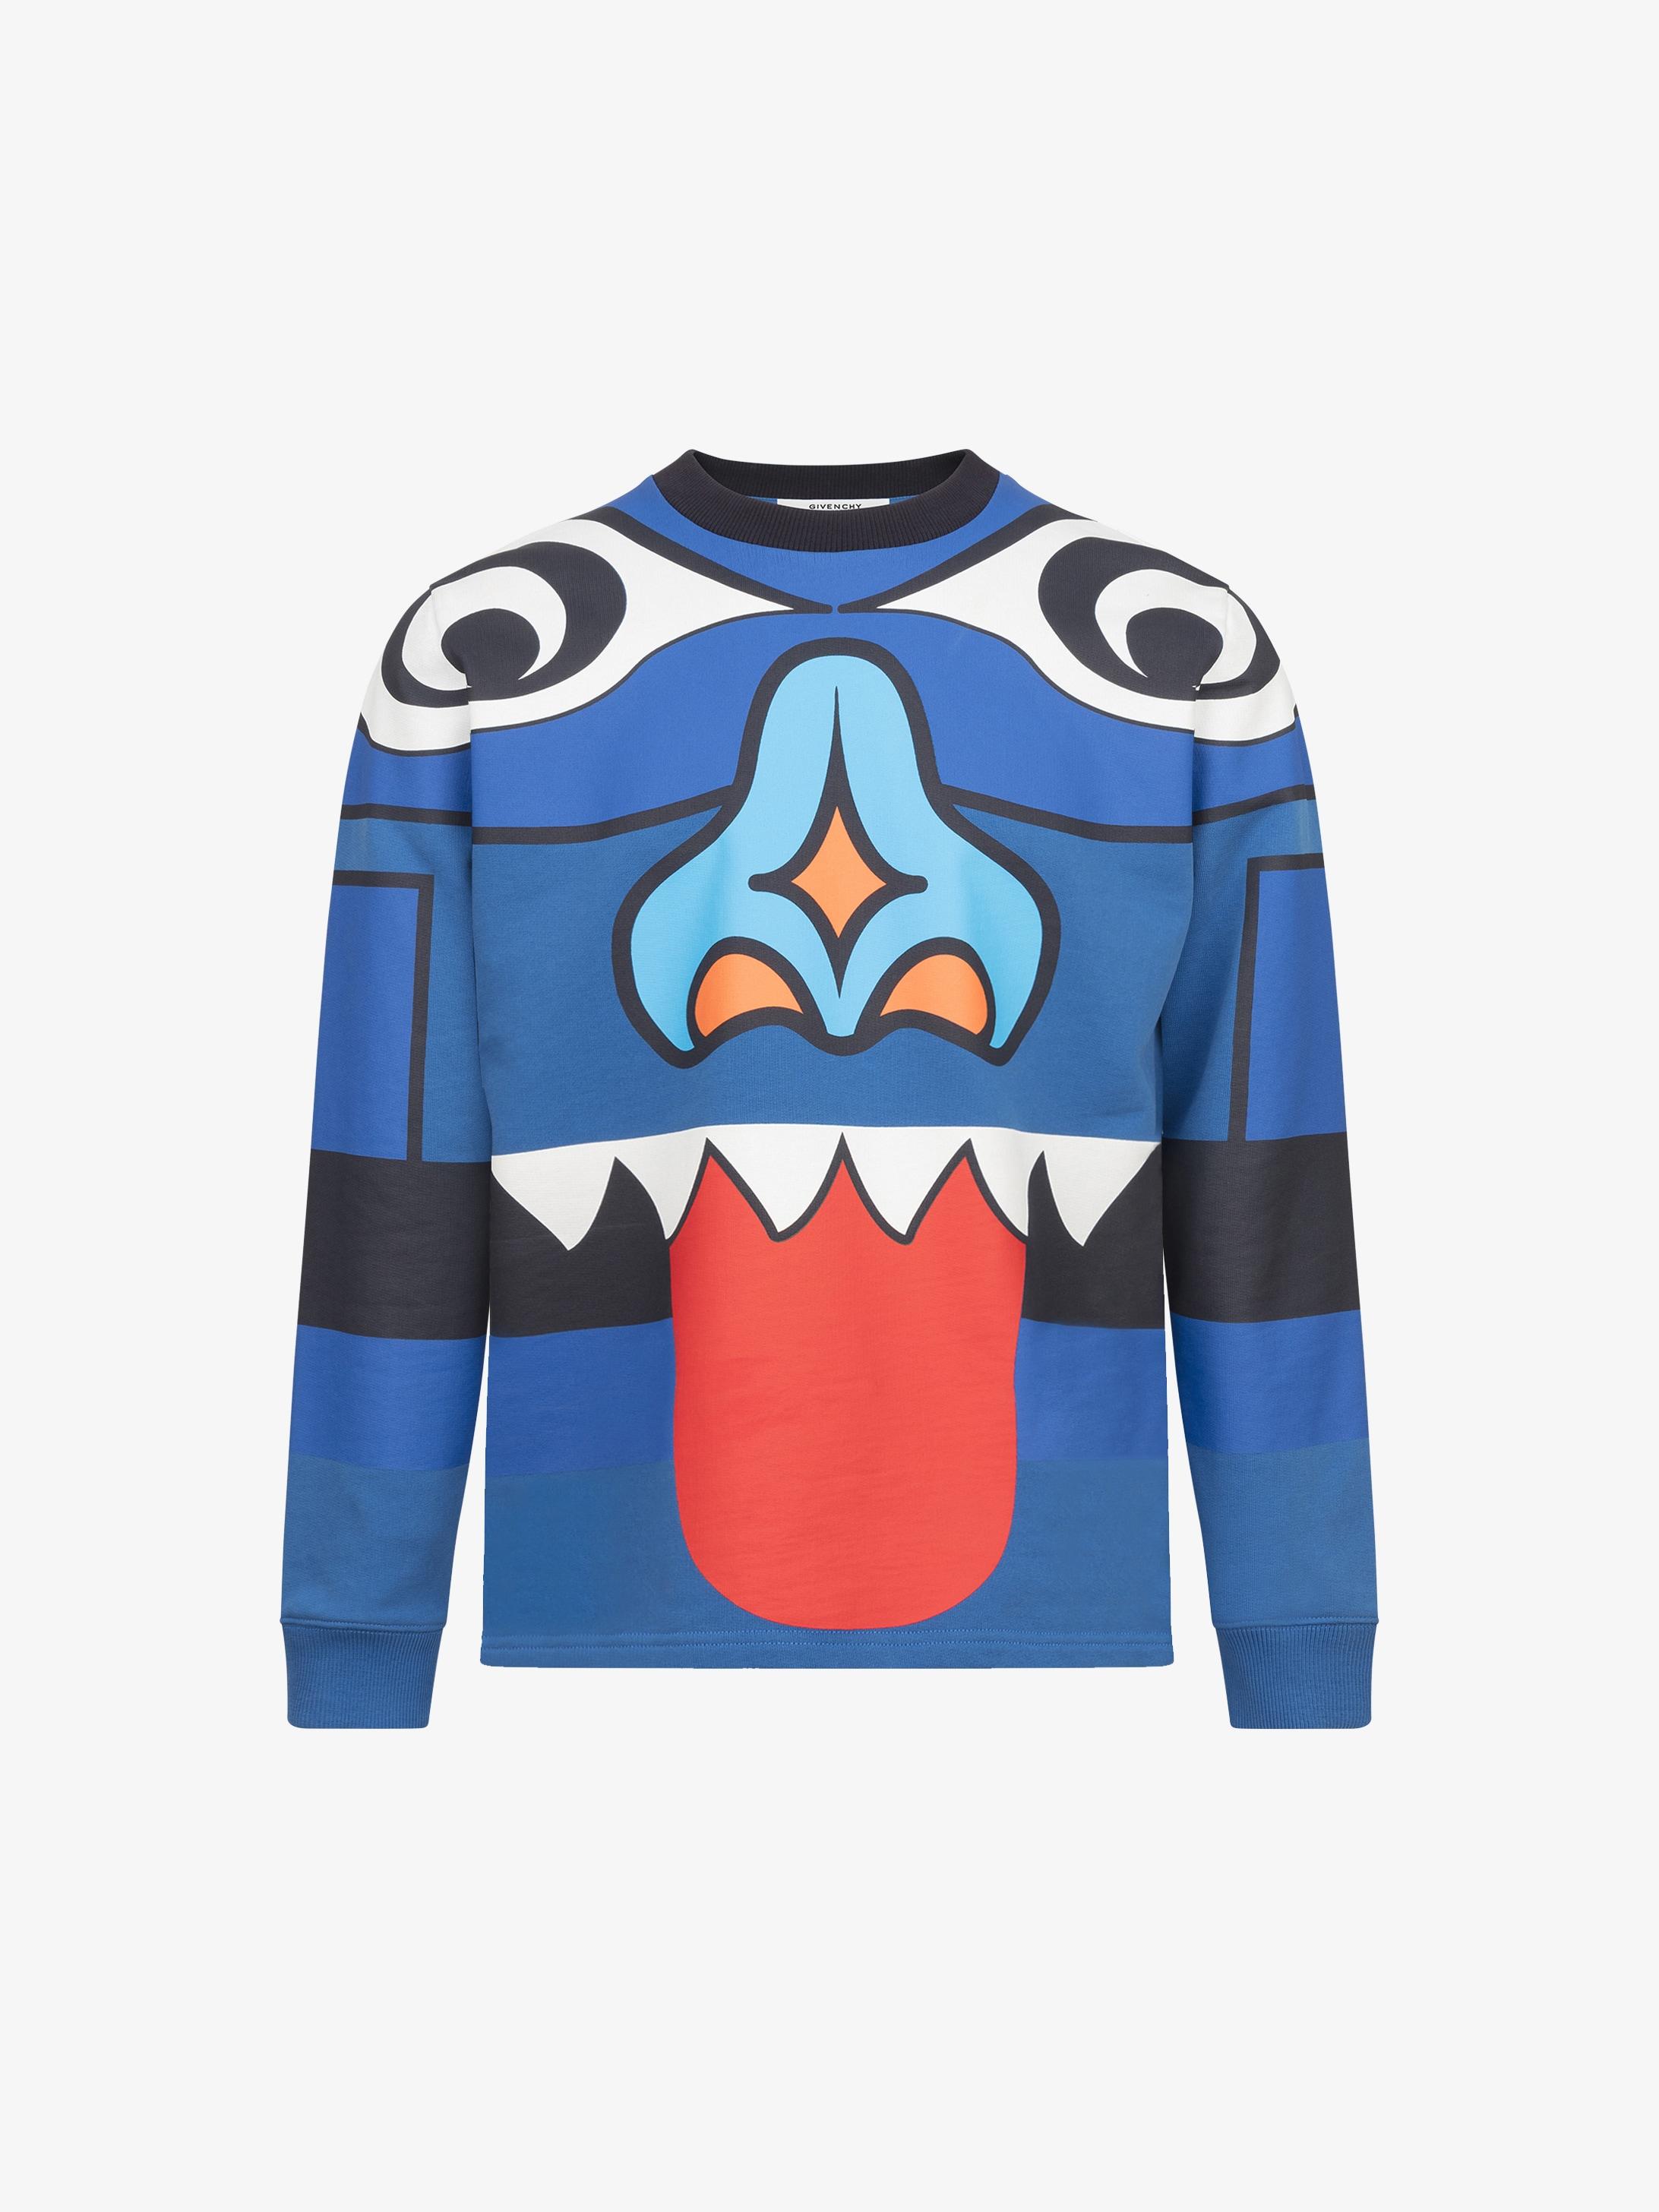 Totem printed sweatshirt